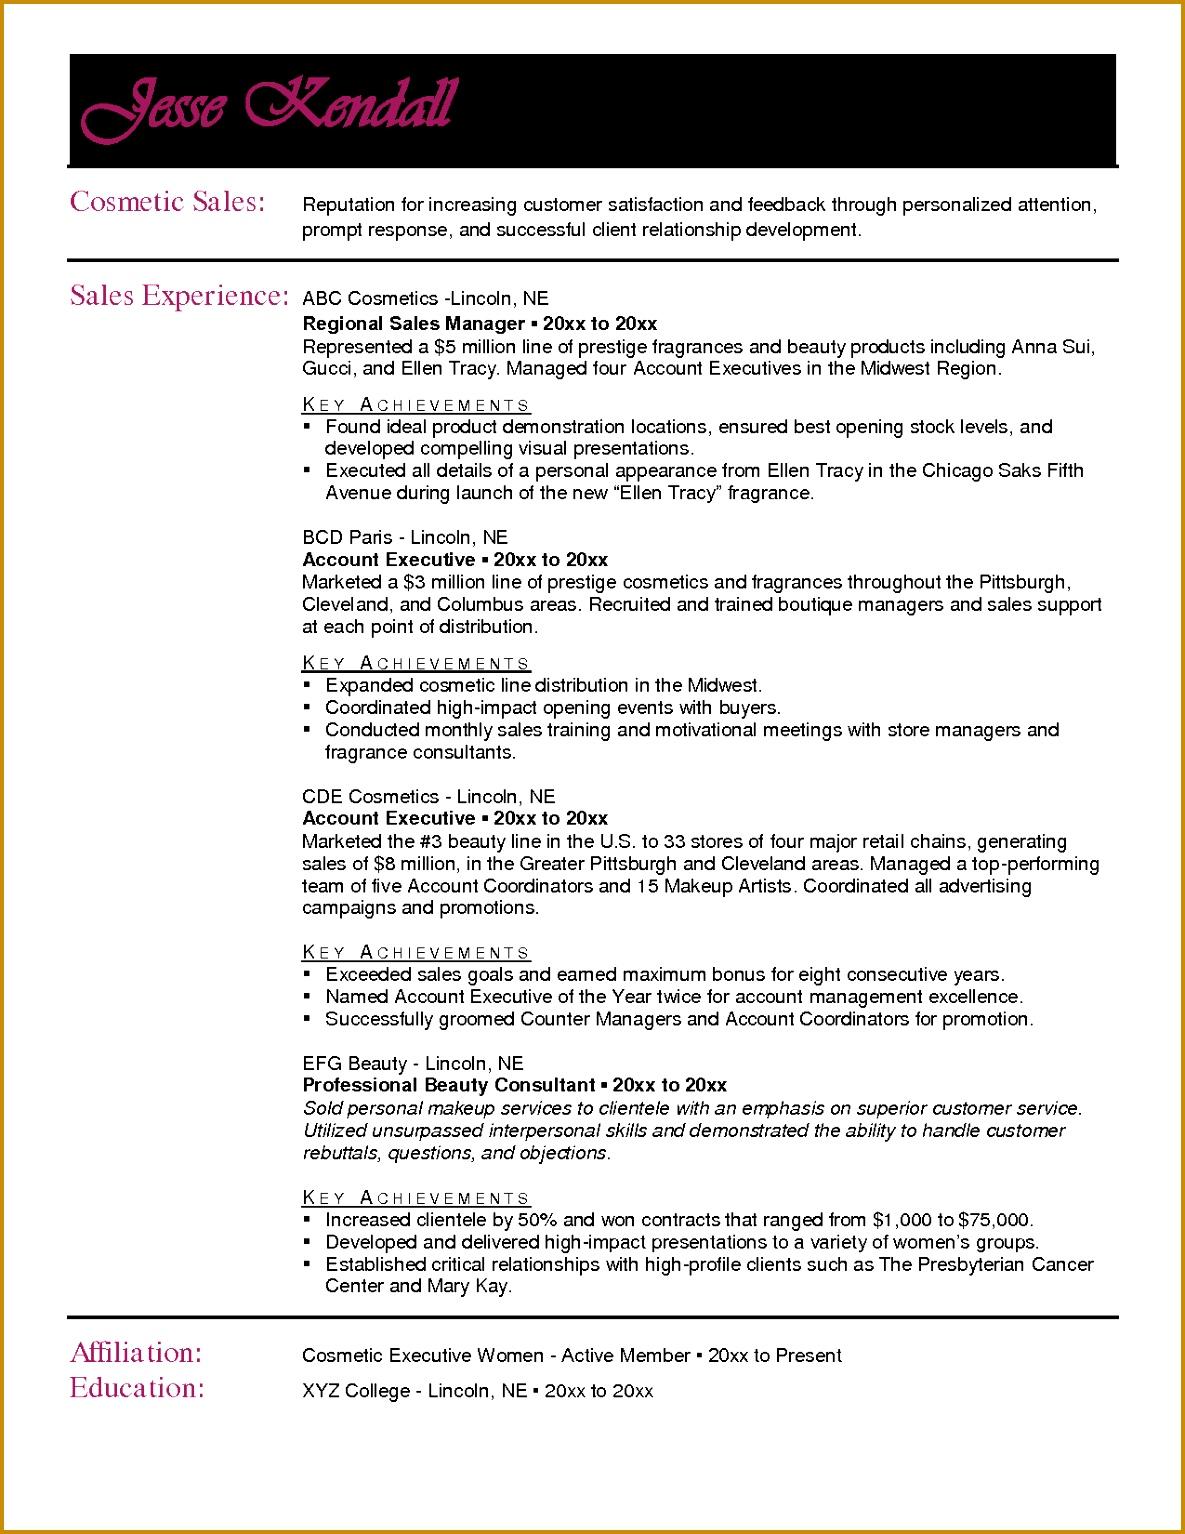 4 Confirmation Letter Volunteer Work | FabTemplatez